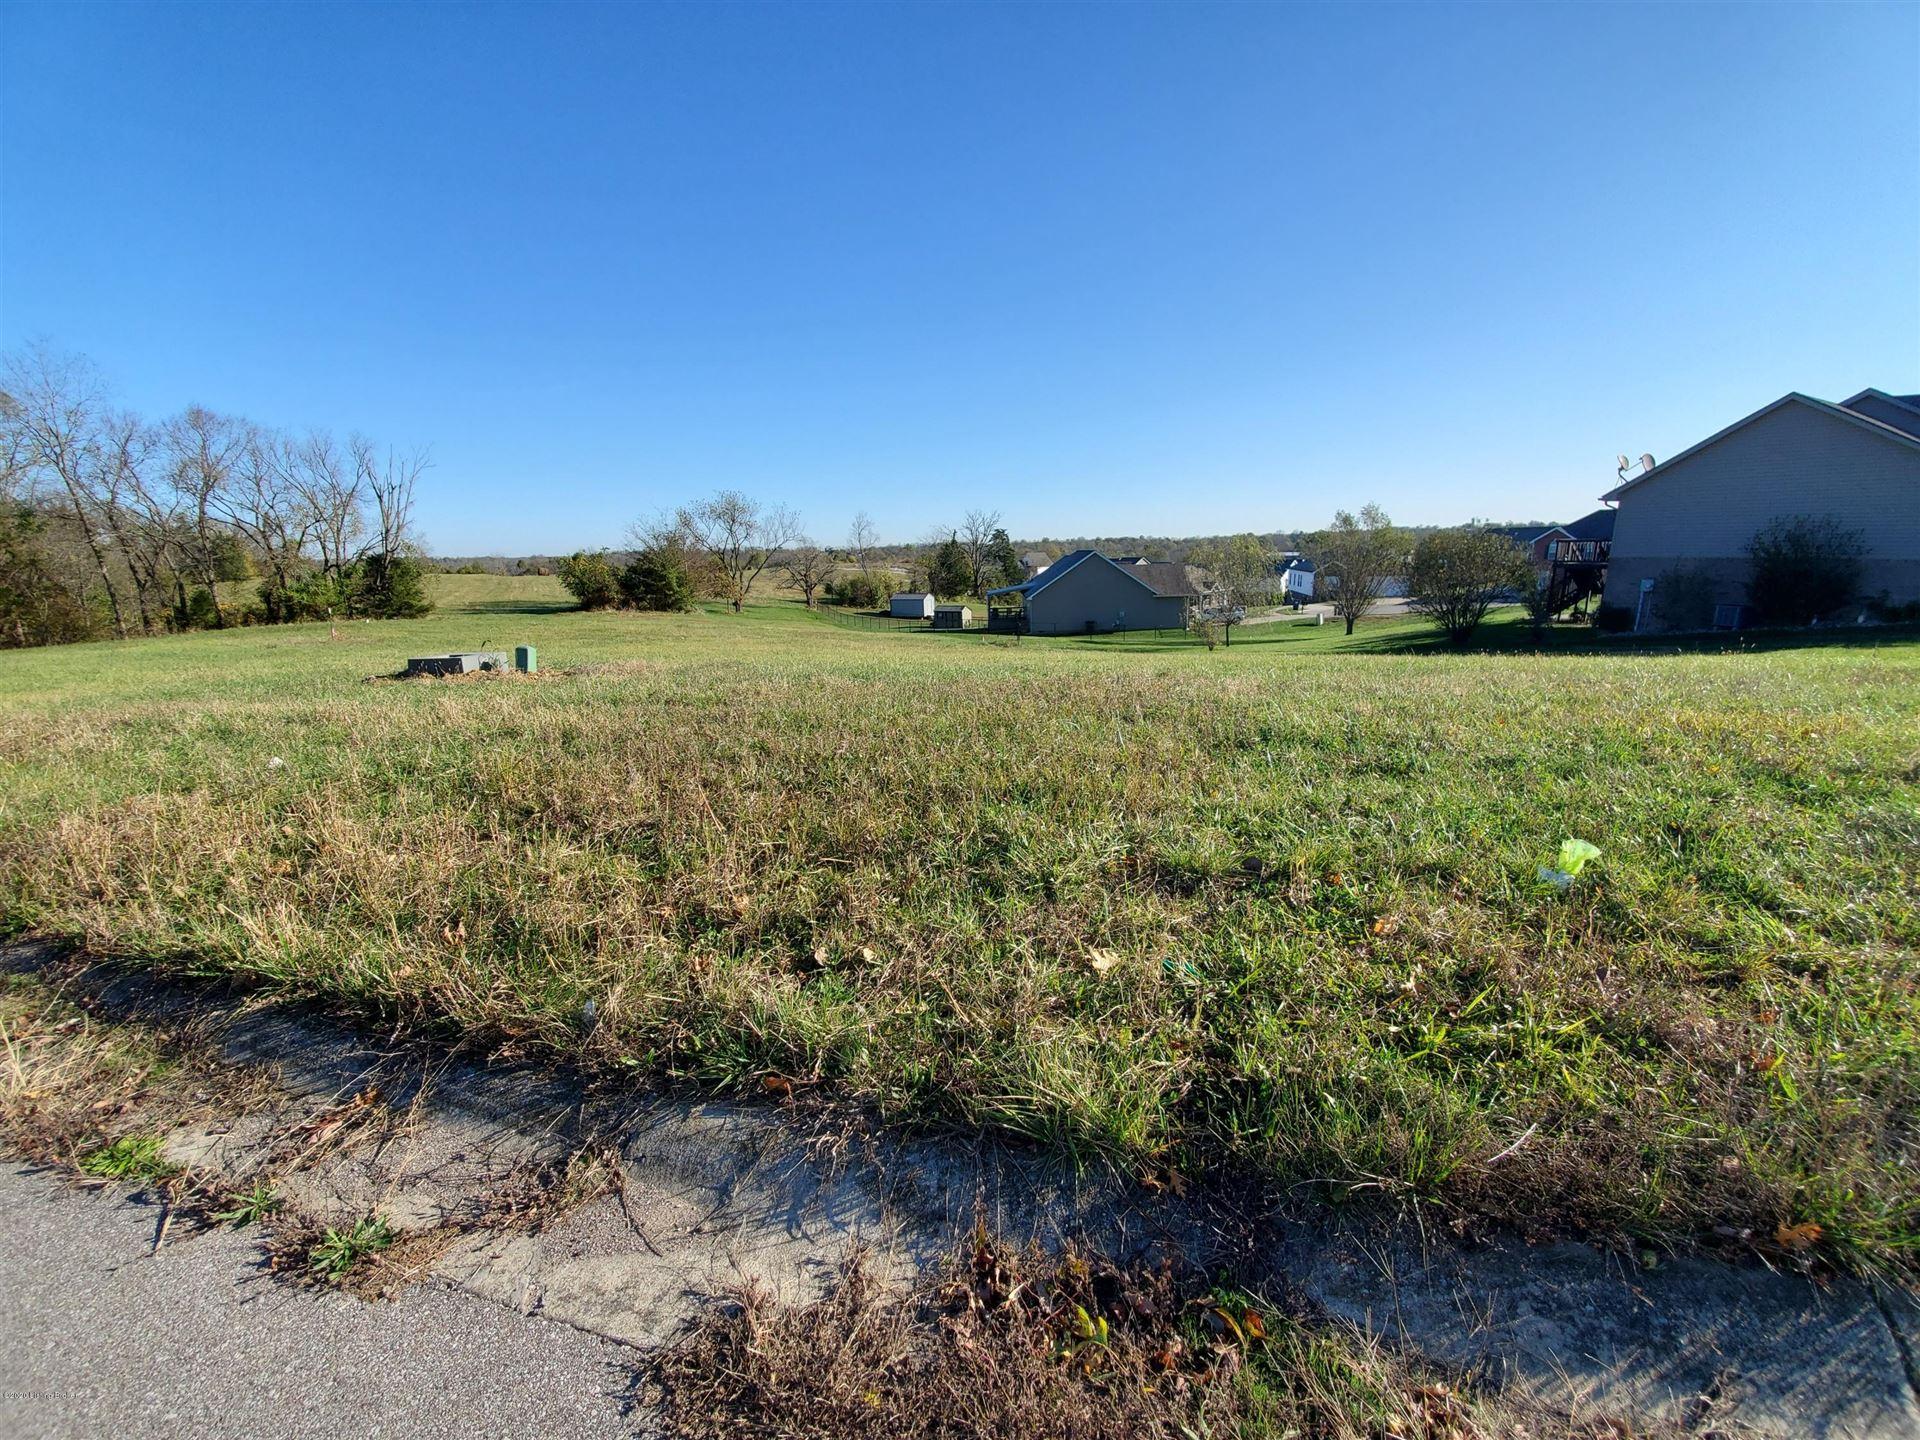 Photo of Lot 376 Mockingbird Dr, Taylorsville, KY 40071 (MLS # 1573695)